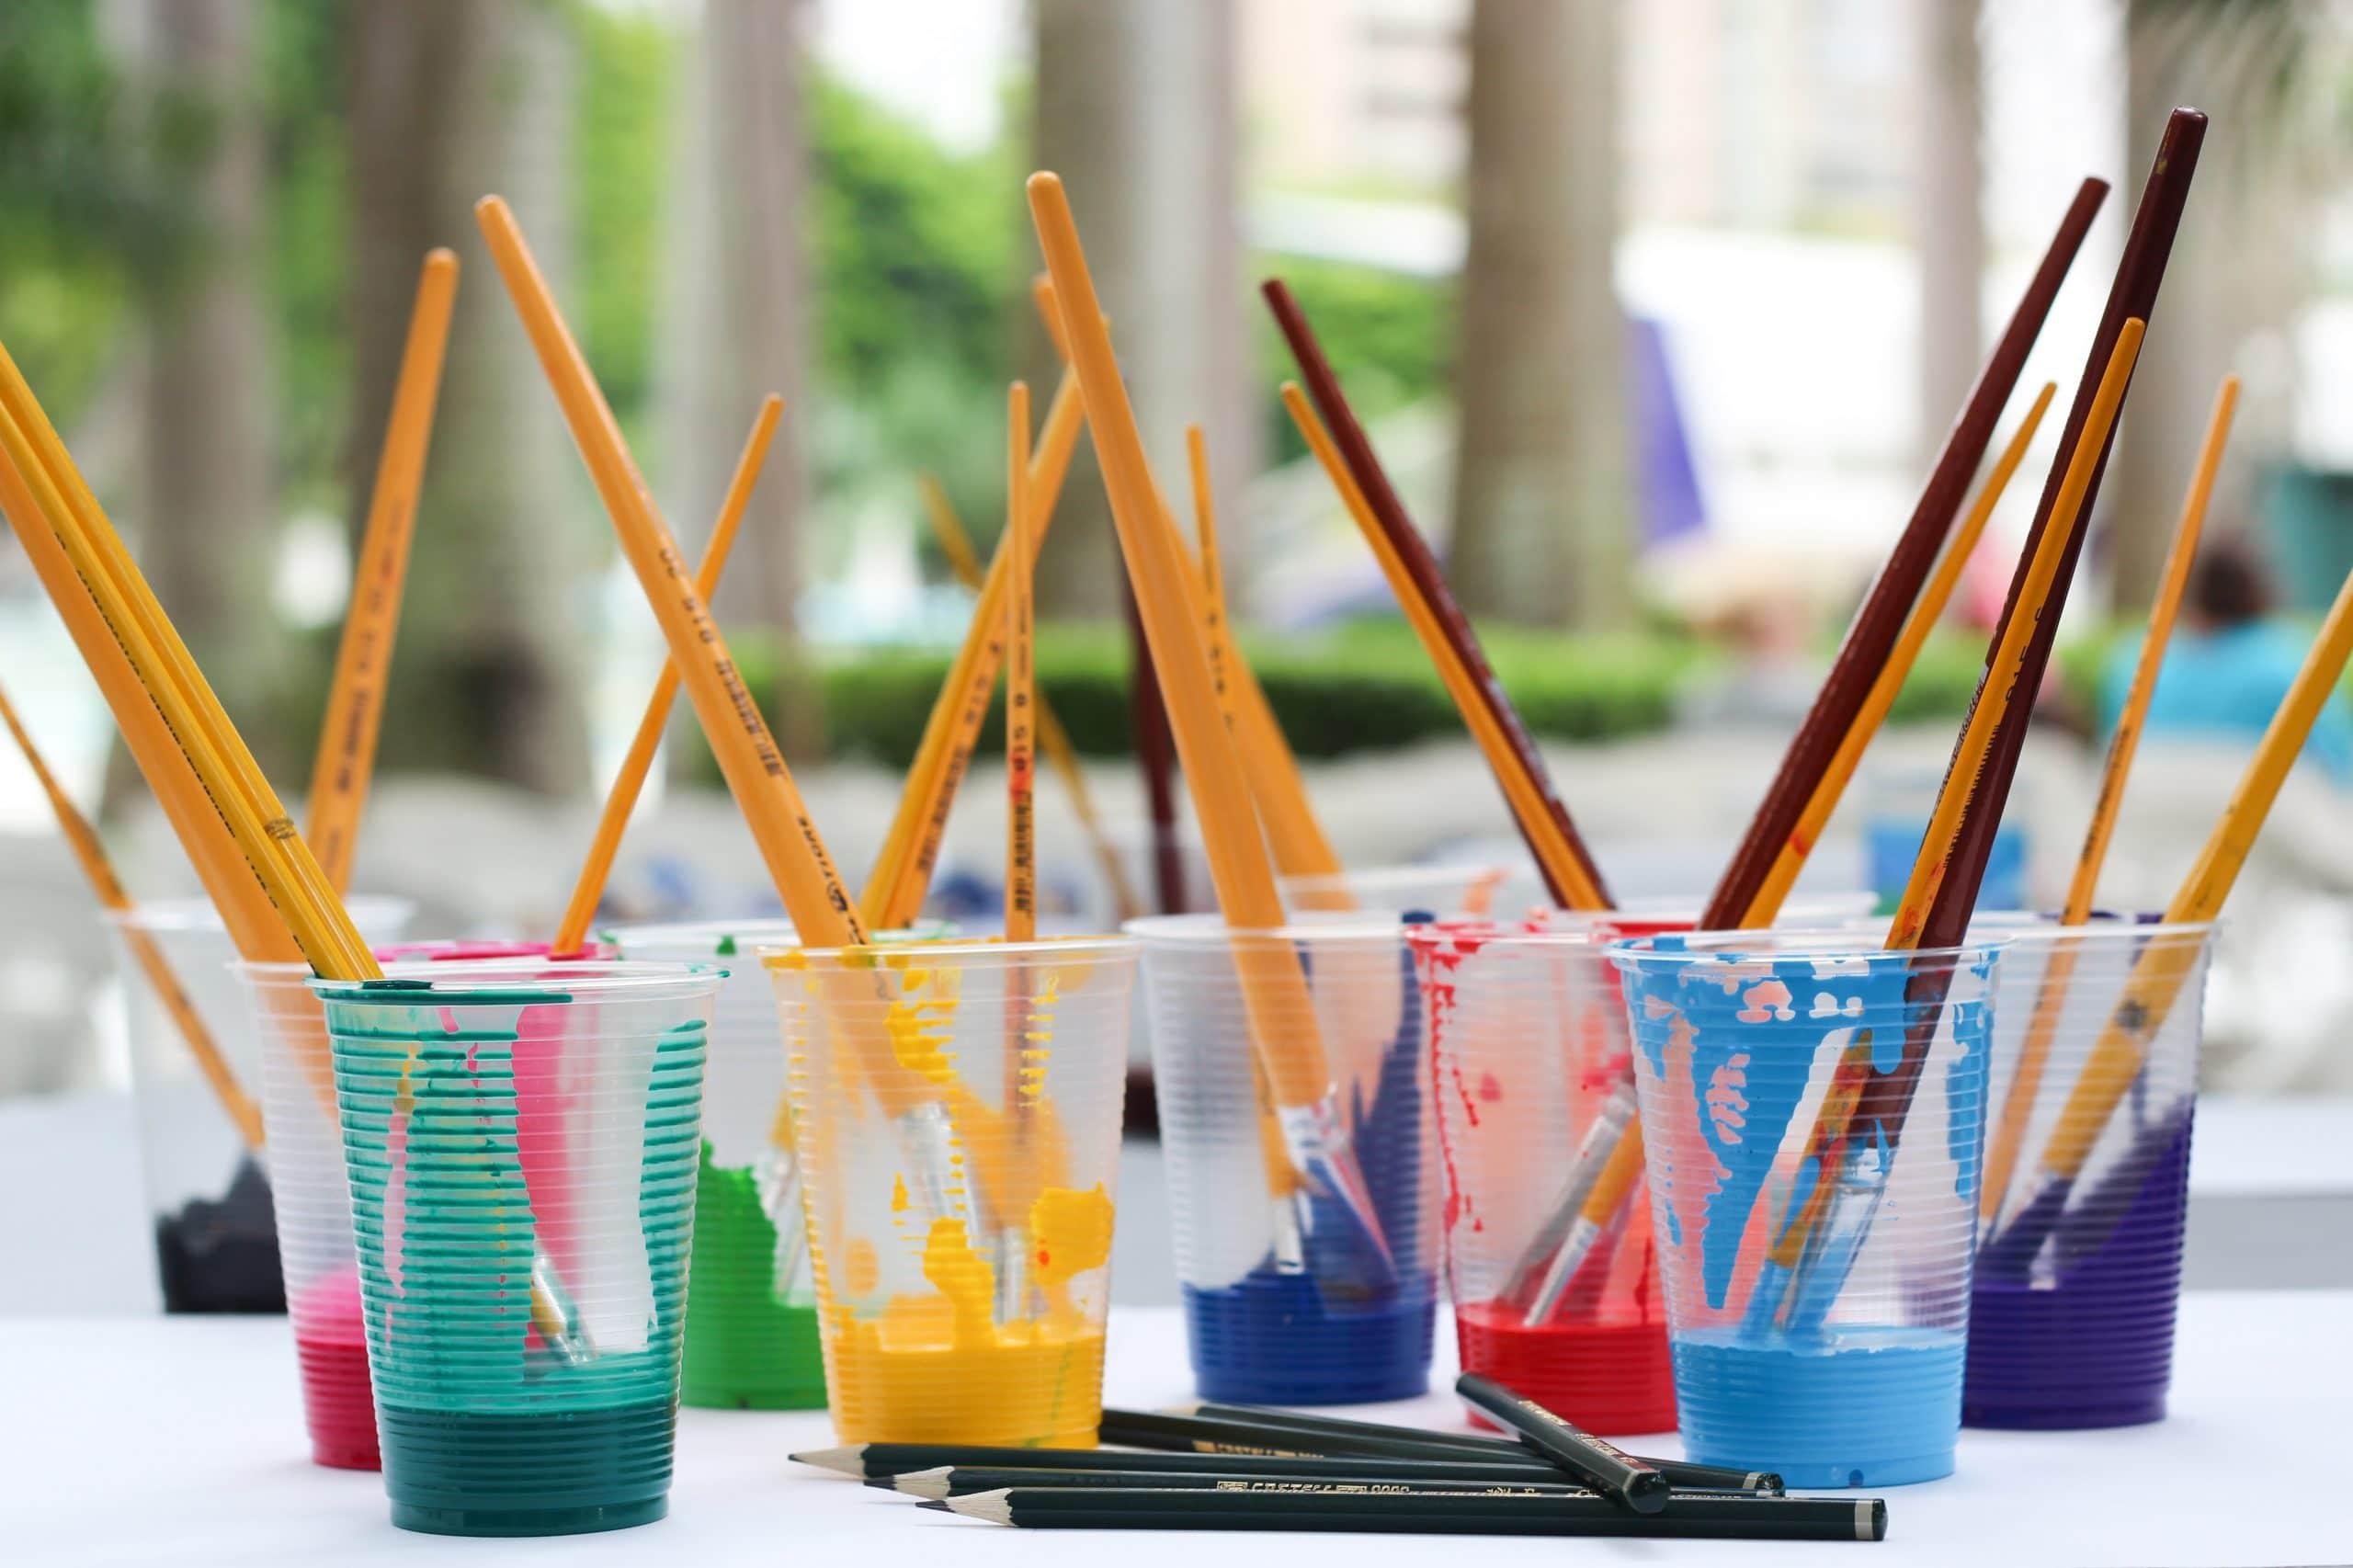 Copos de plástico com pinceis e tintas coloridas